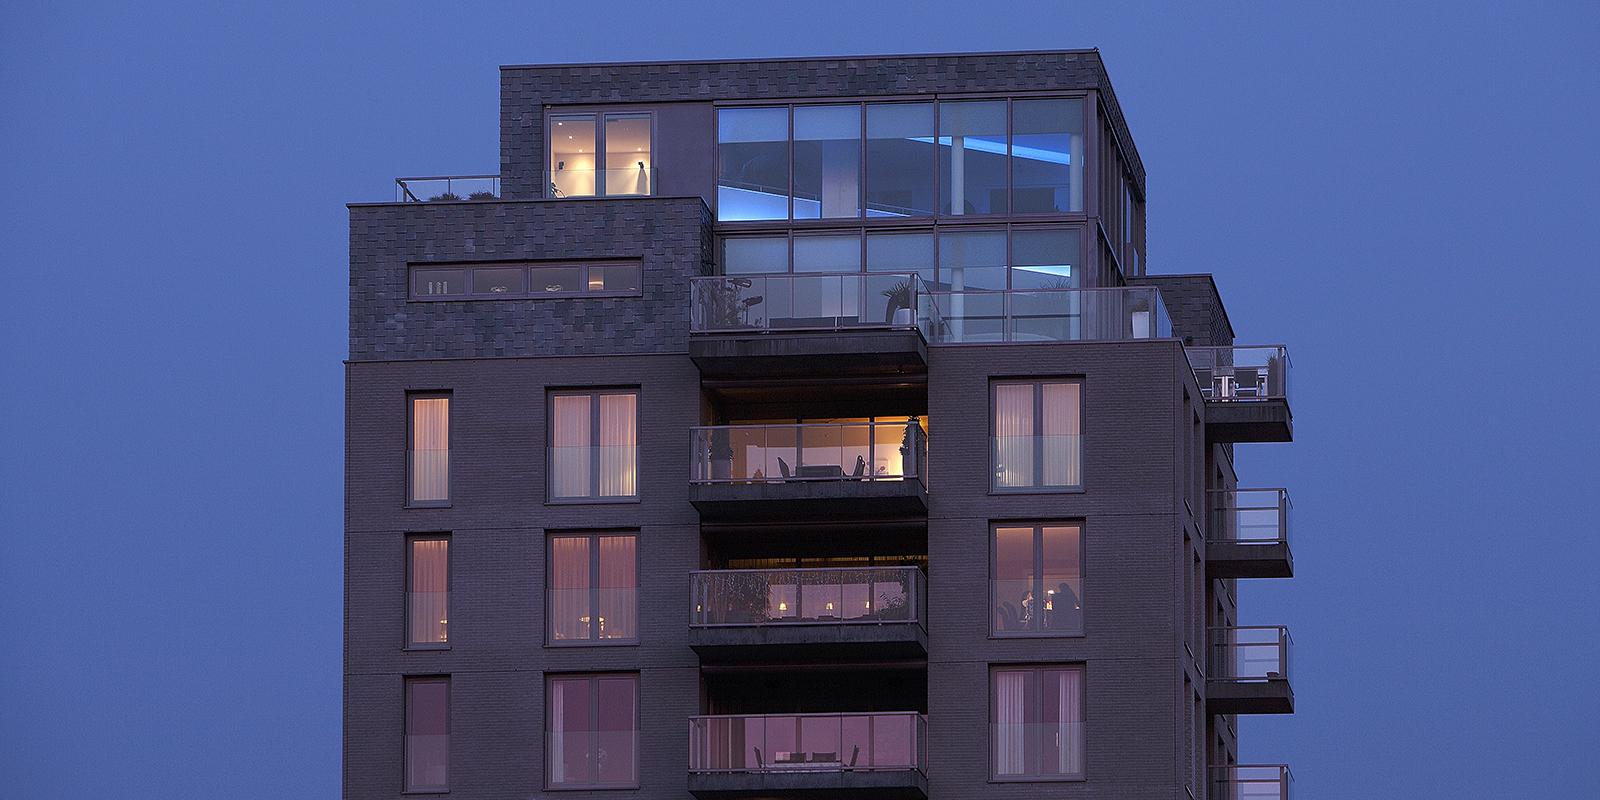 The Art of Living, Exclusief wonen, Architect Crepain, penthouse, luxe, design, modern, inspiratie, exterieur, glas, dakterras